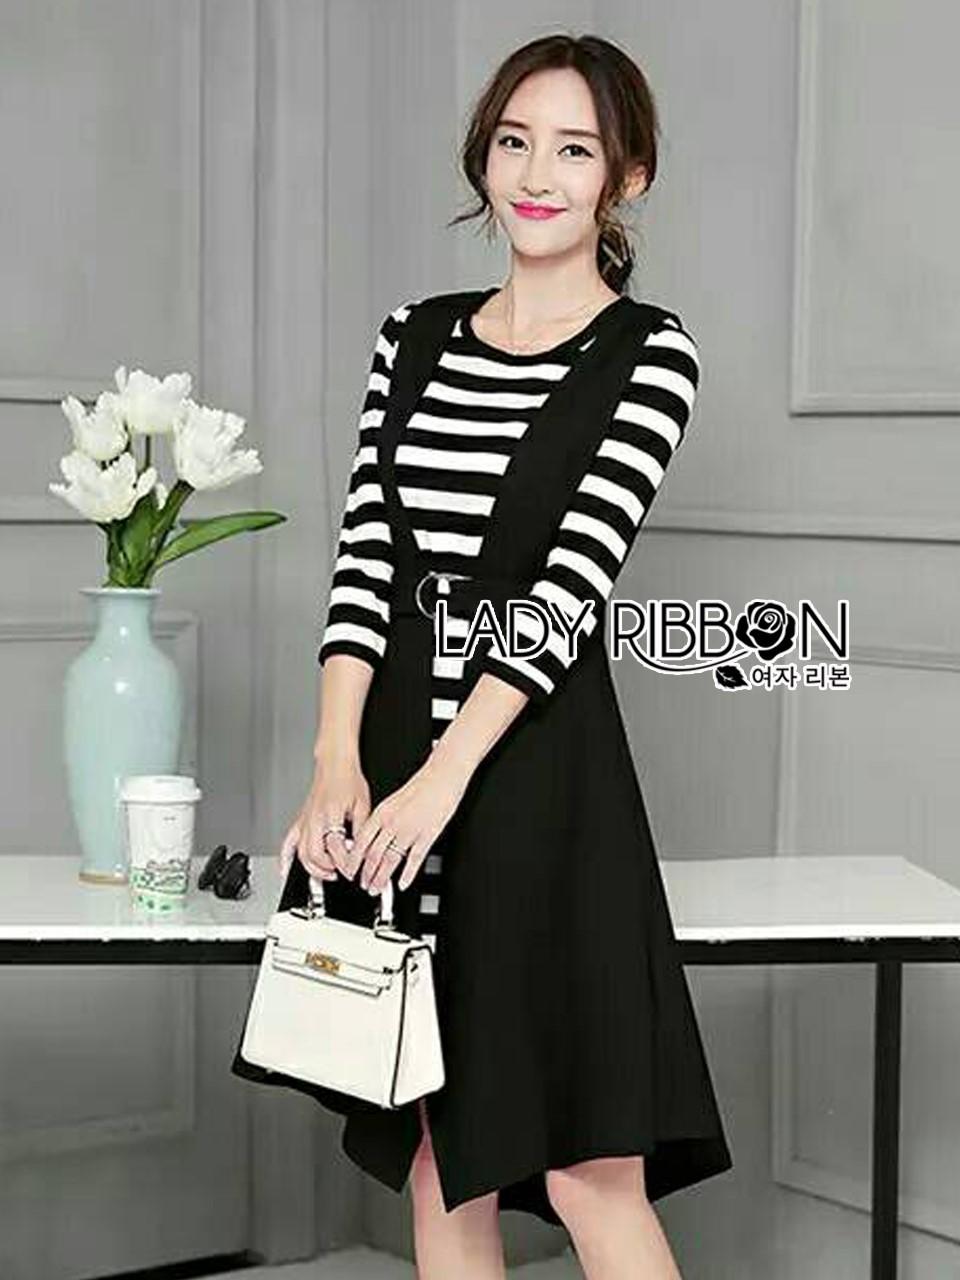 &#x1F380 Lady Ribbon's Made &#x1F380 Lady Grace knit Chic Striped Overall Black Dress